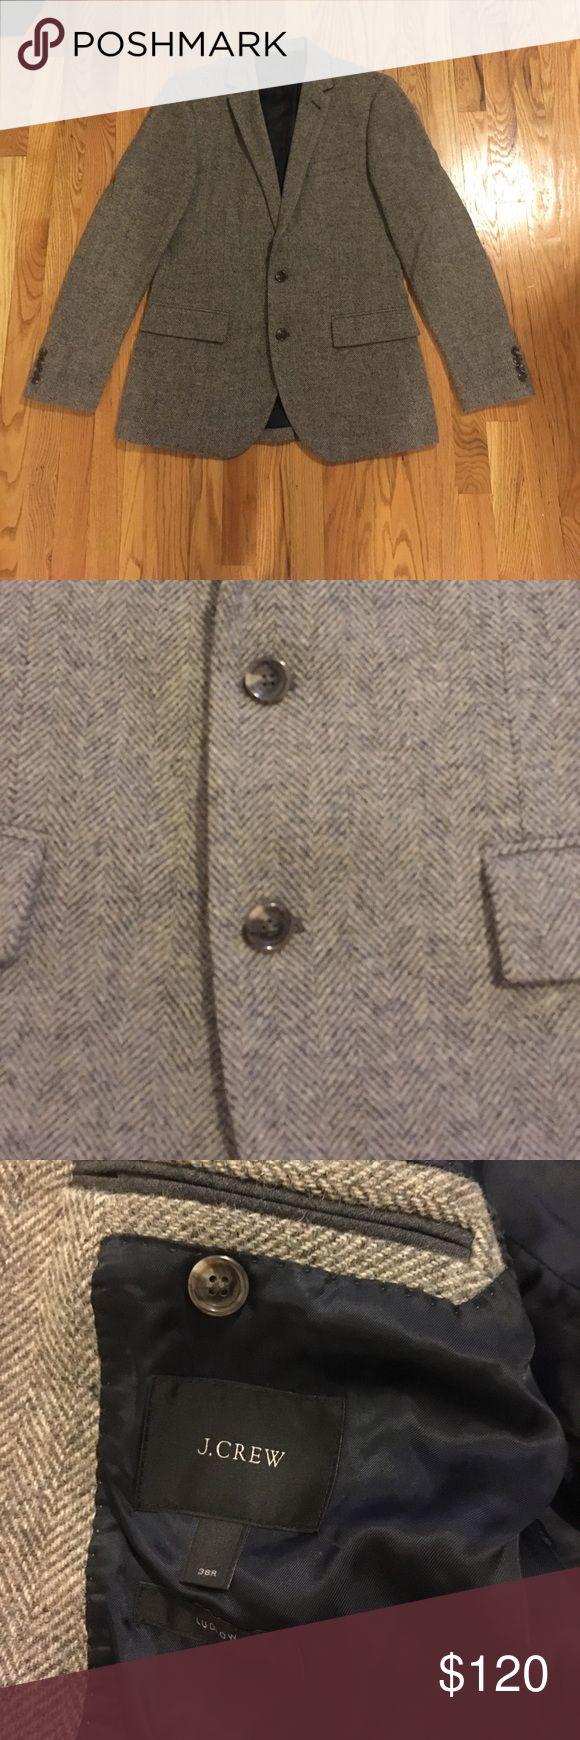 PRICE ⬇ JCrew blazer Brown tweed. Like new! J. Crew Suits & Blazers Sport Coats & Blazers